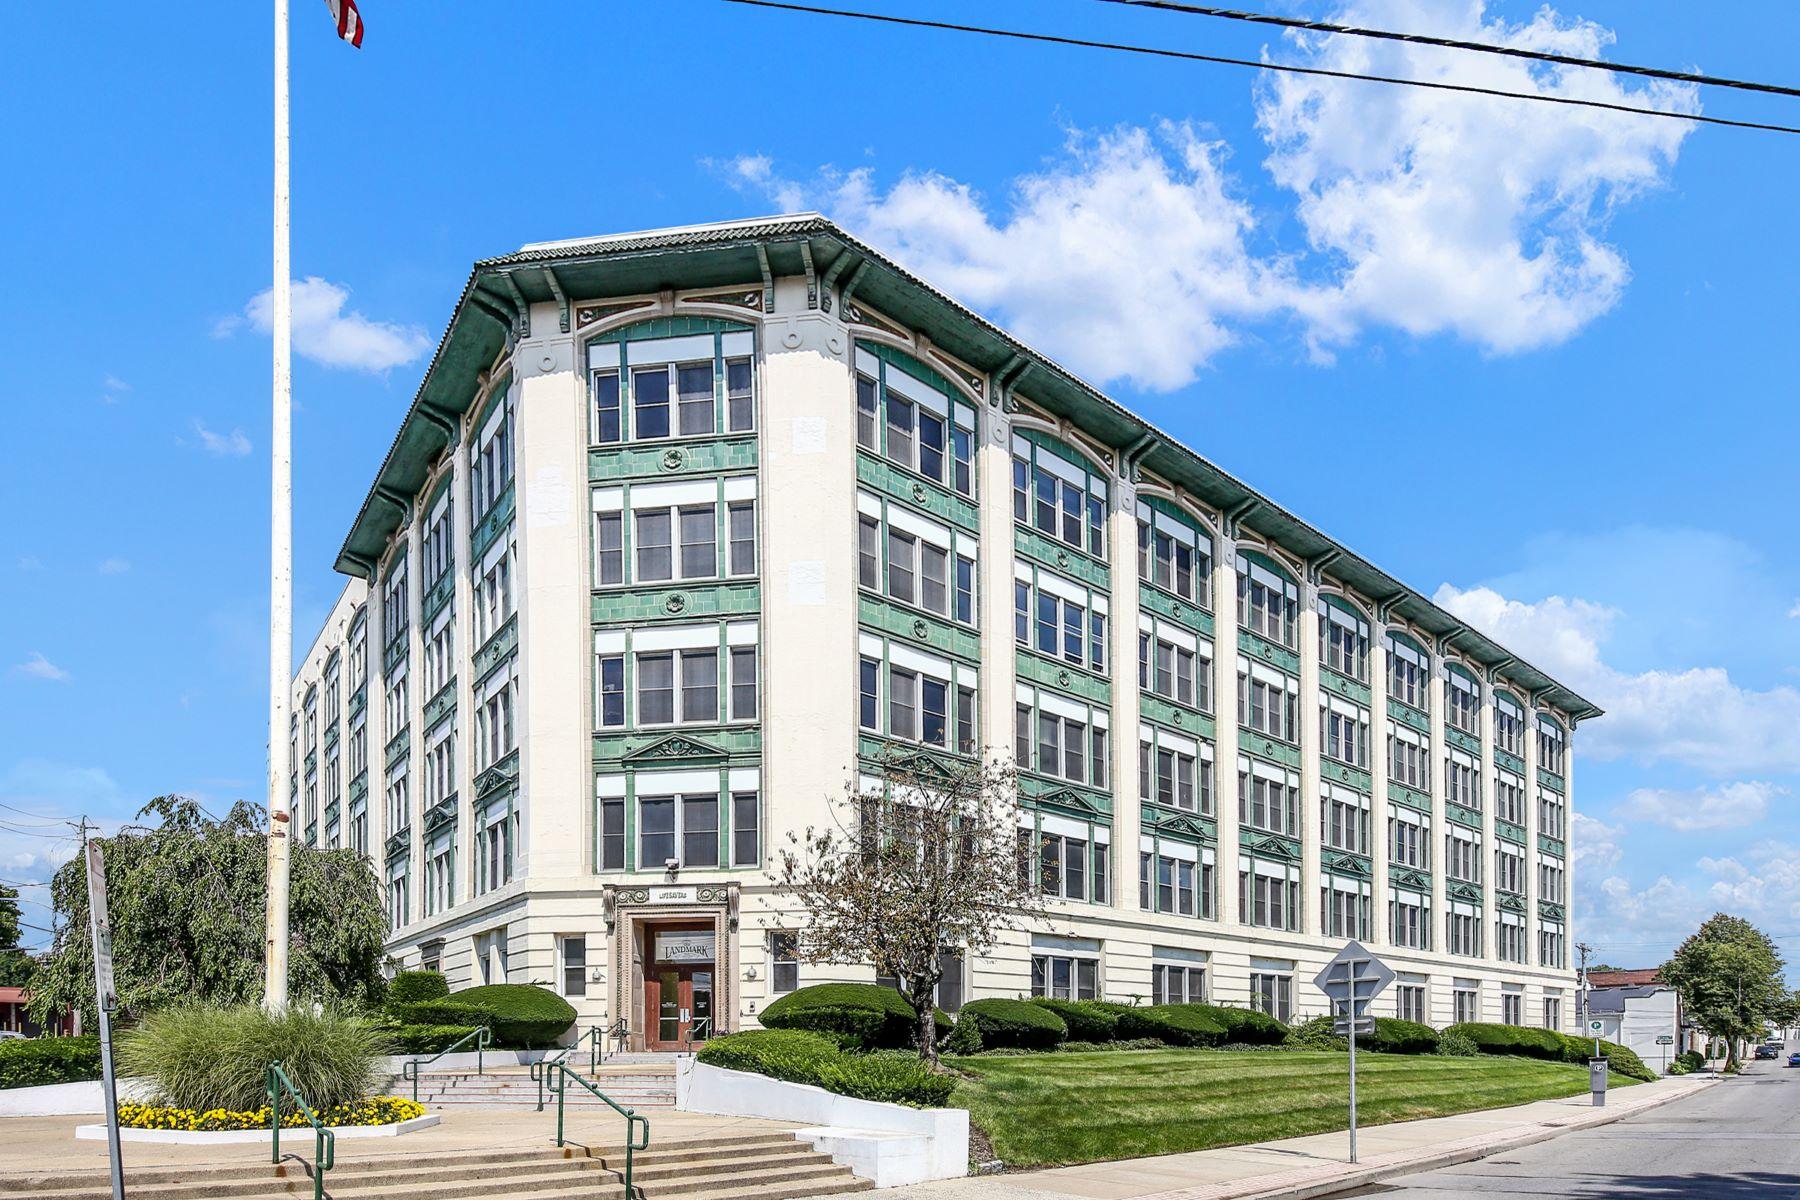 Apartments 為 出售 在 1 Landmark Square 610, Port Chester, 纽约 10573 美國